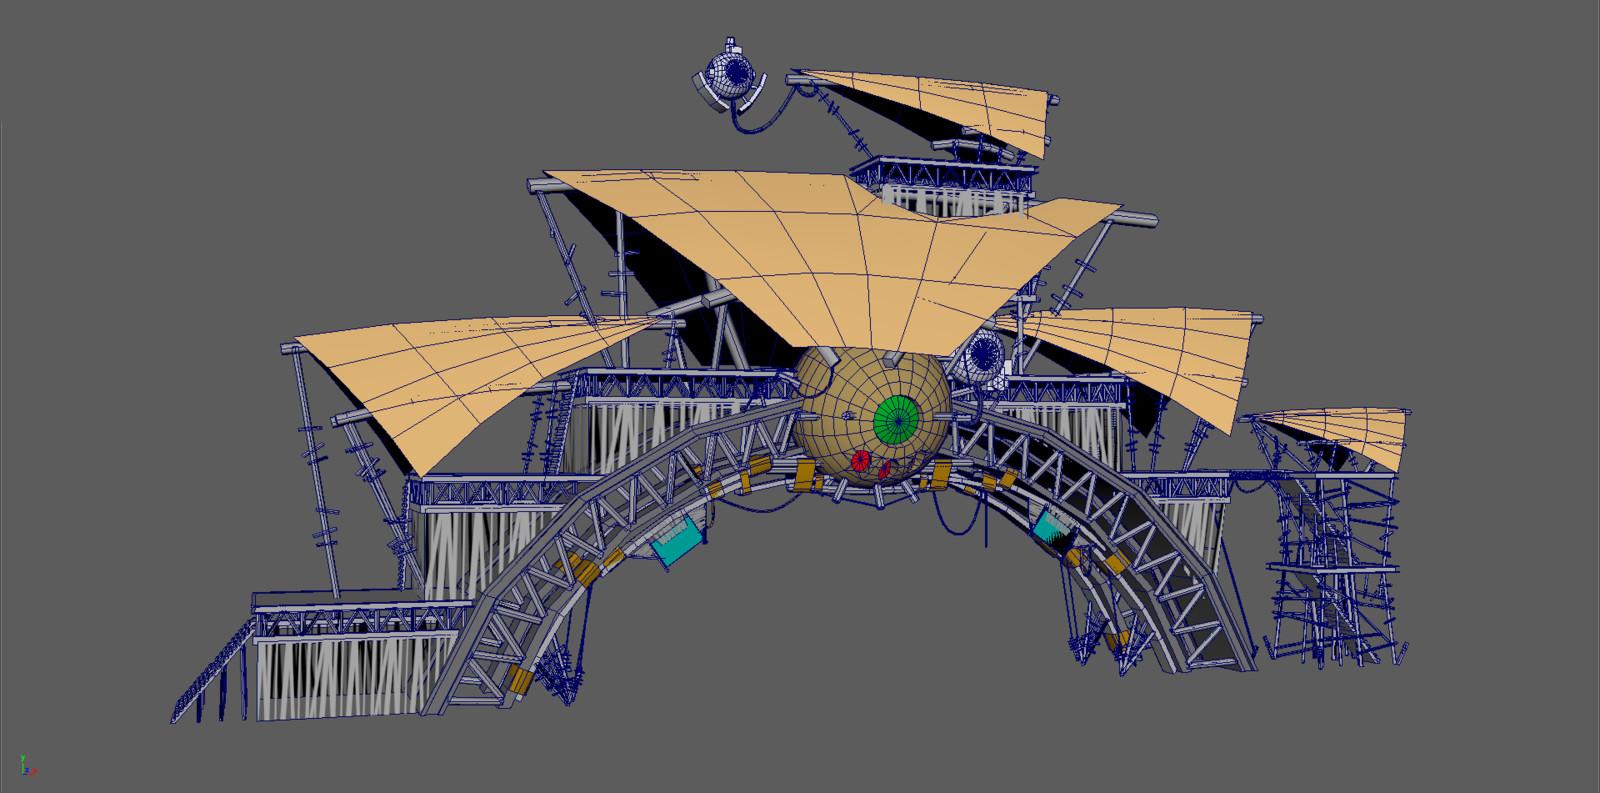 Wireframe 3D model of Race Start/finish point